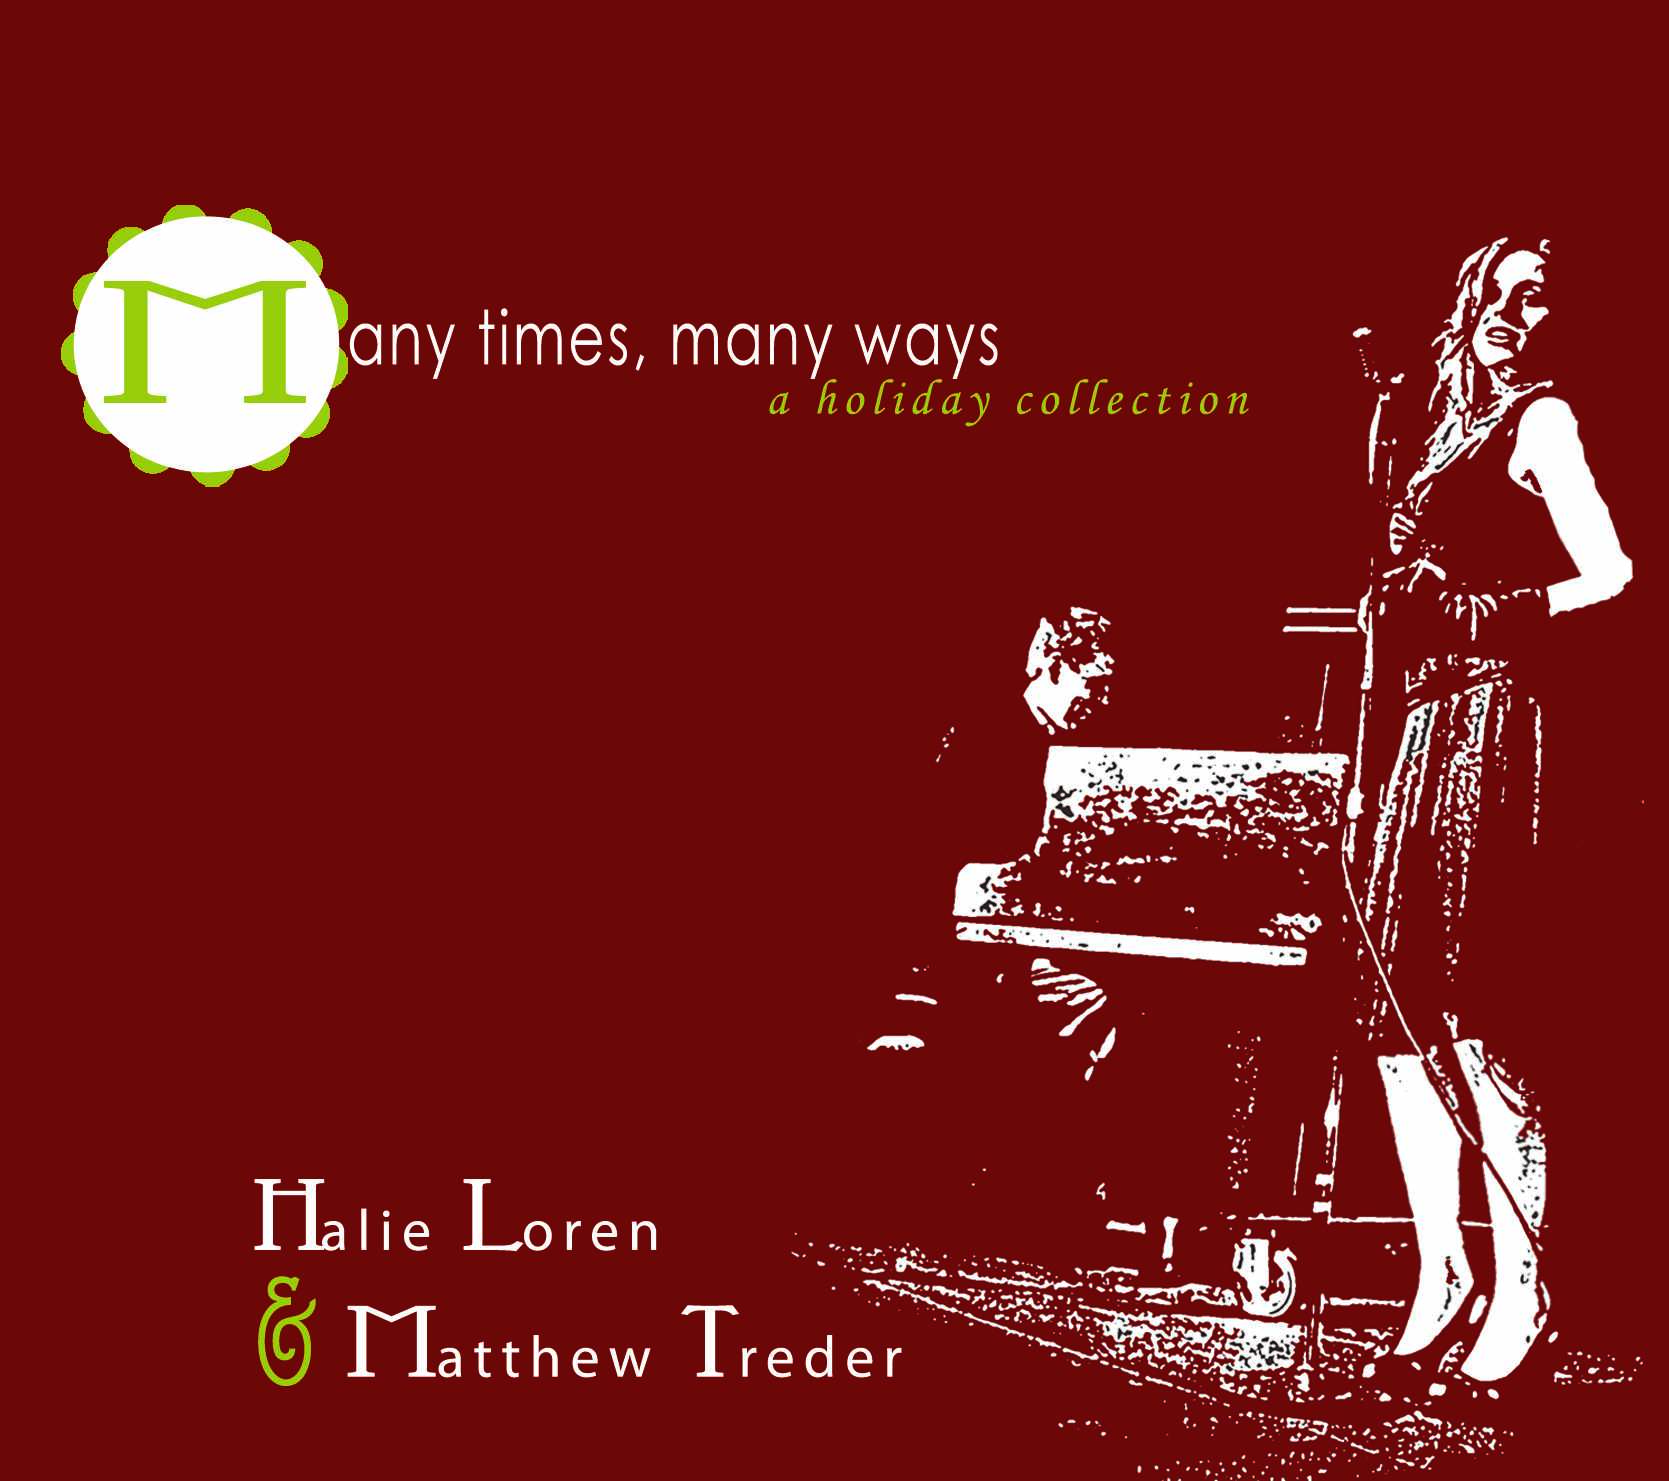 Halie Loren Discography of CDs